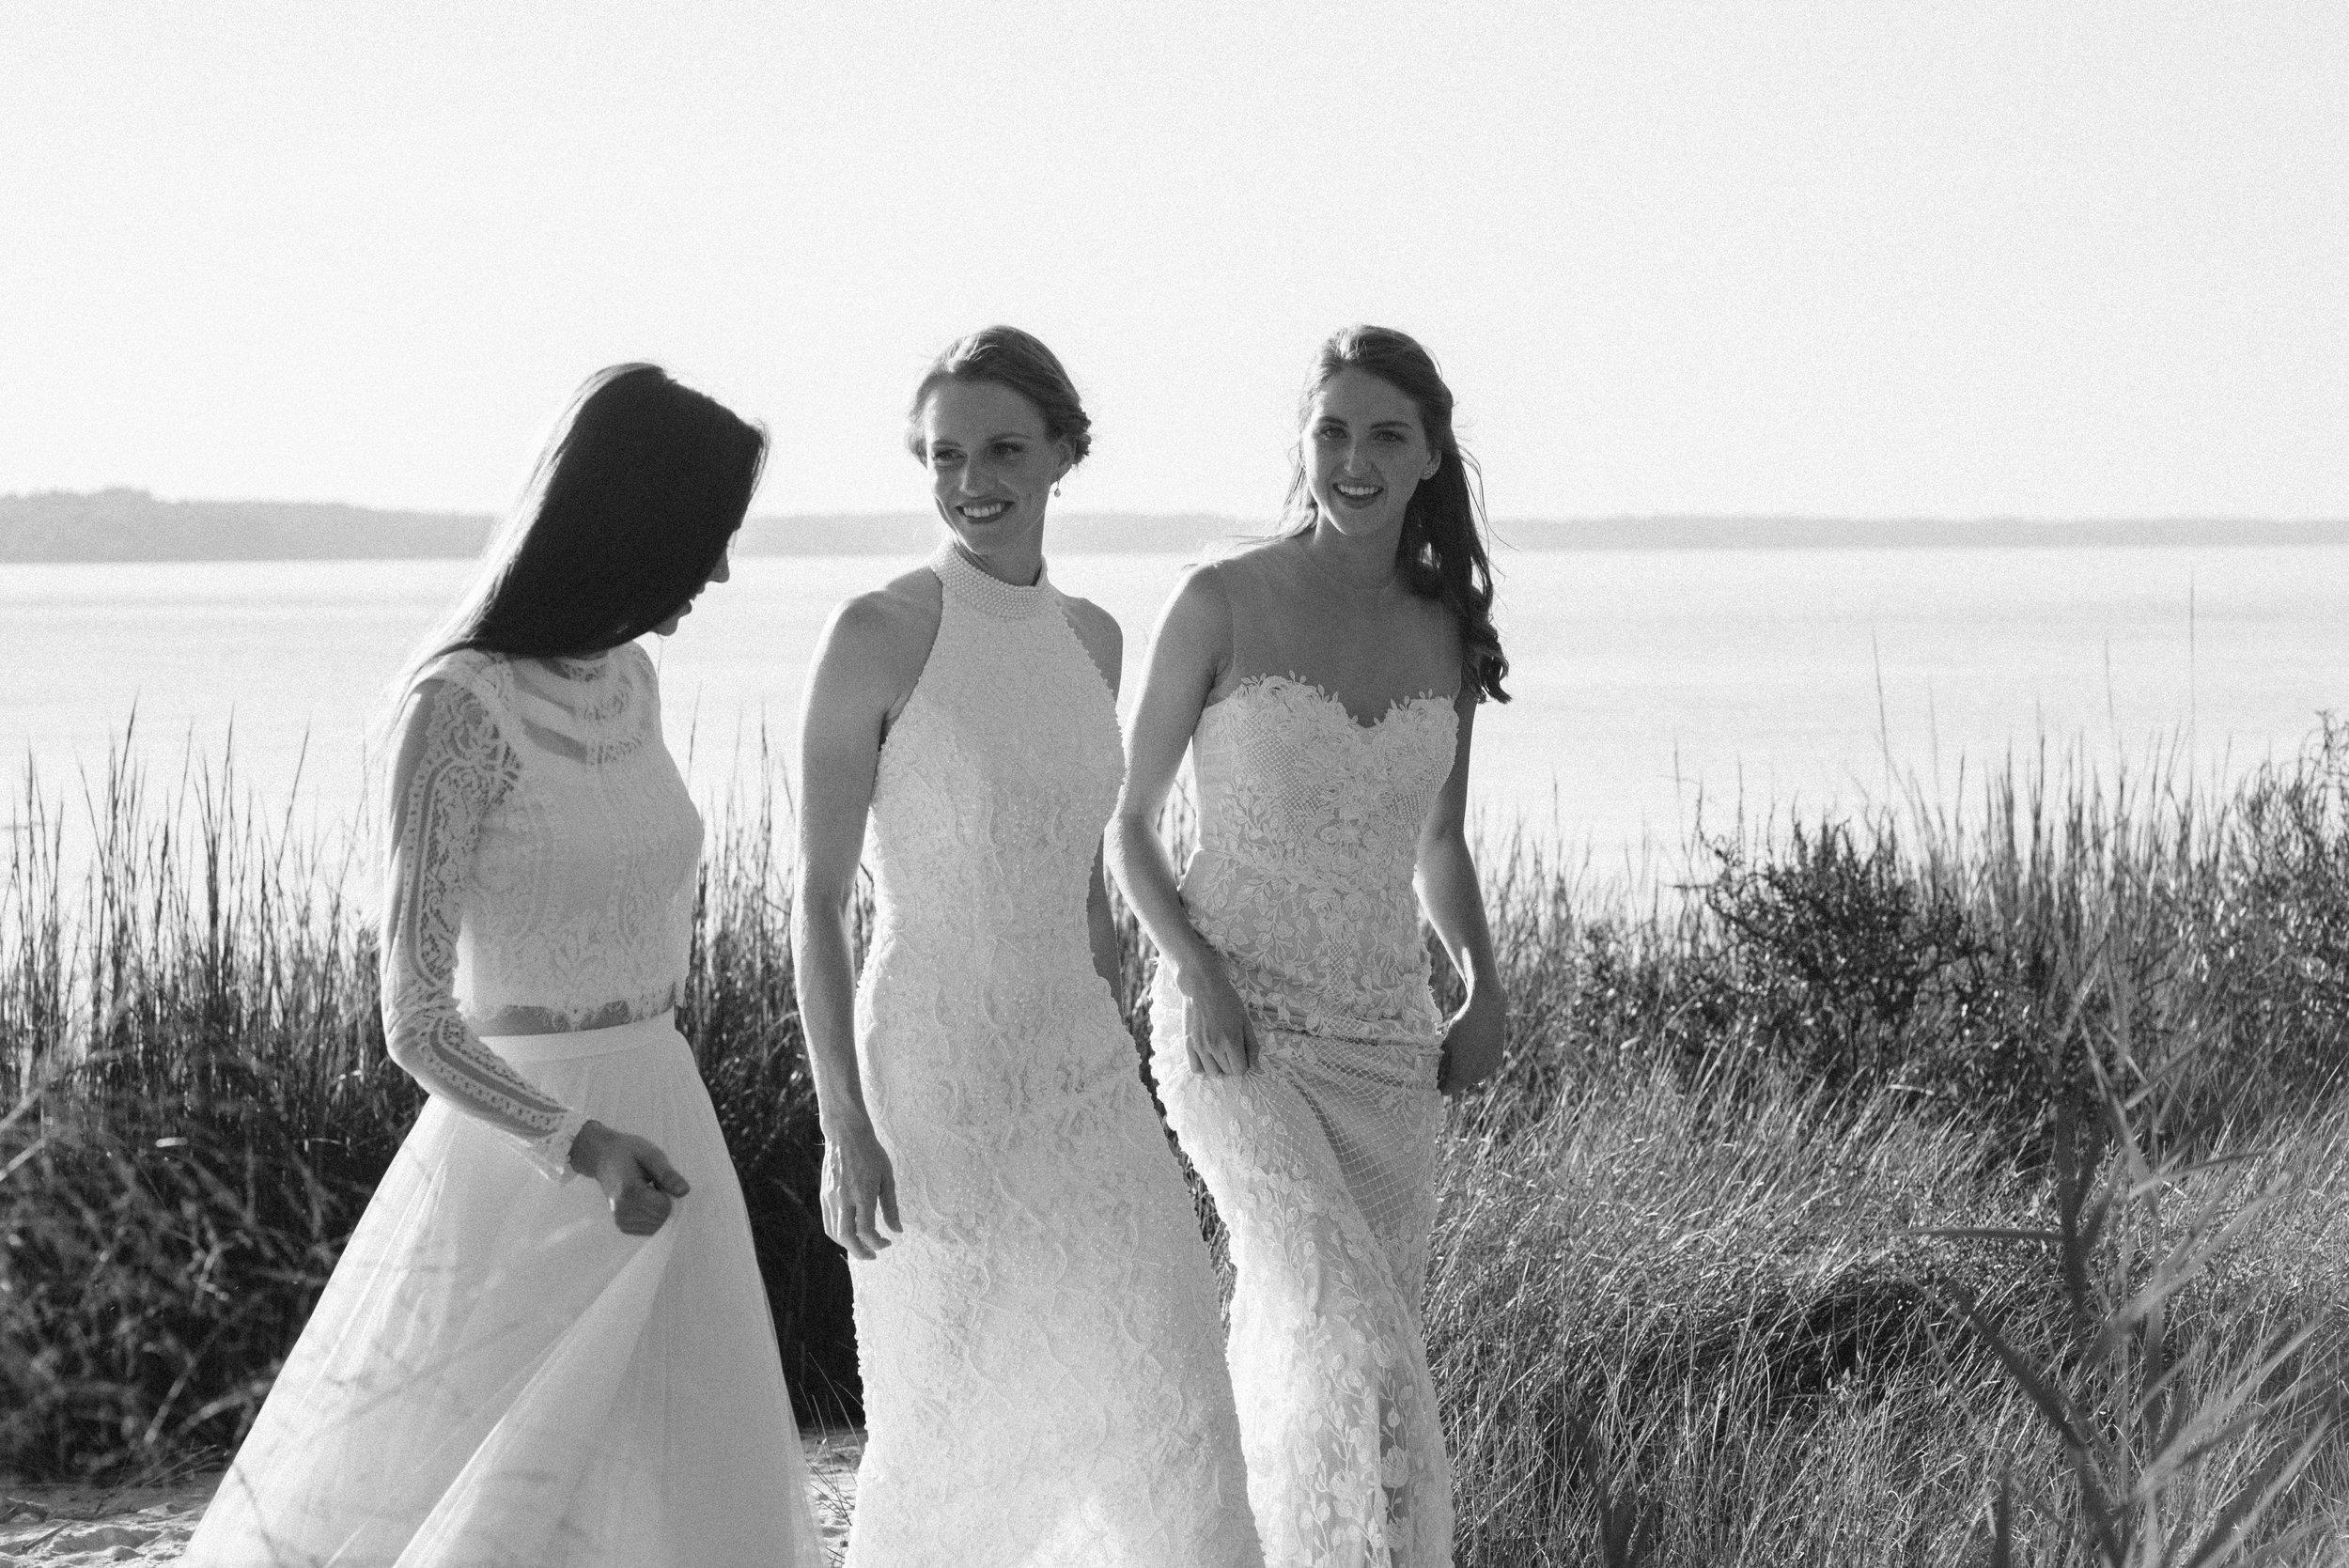 sister wedding dress photo shoot-32.jpg